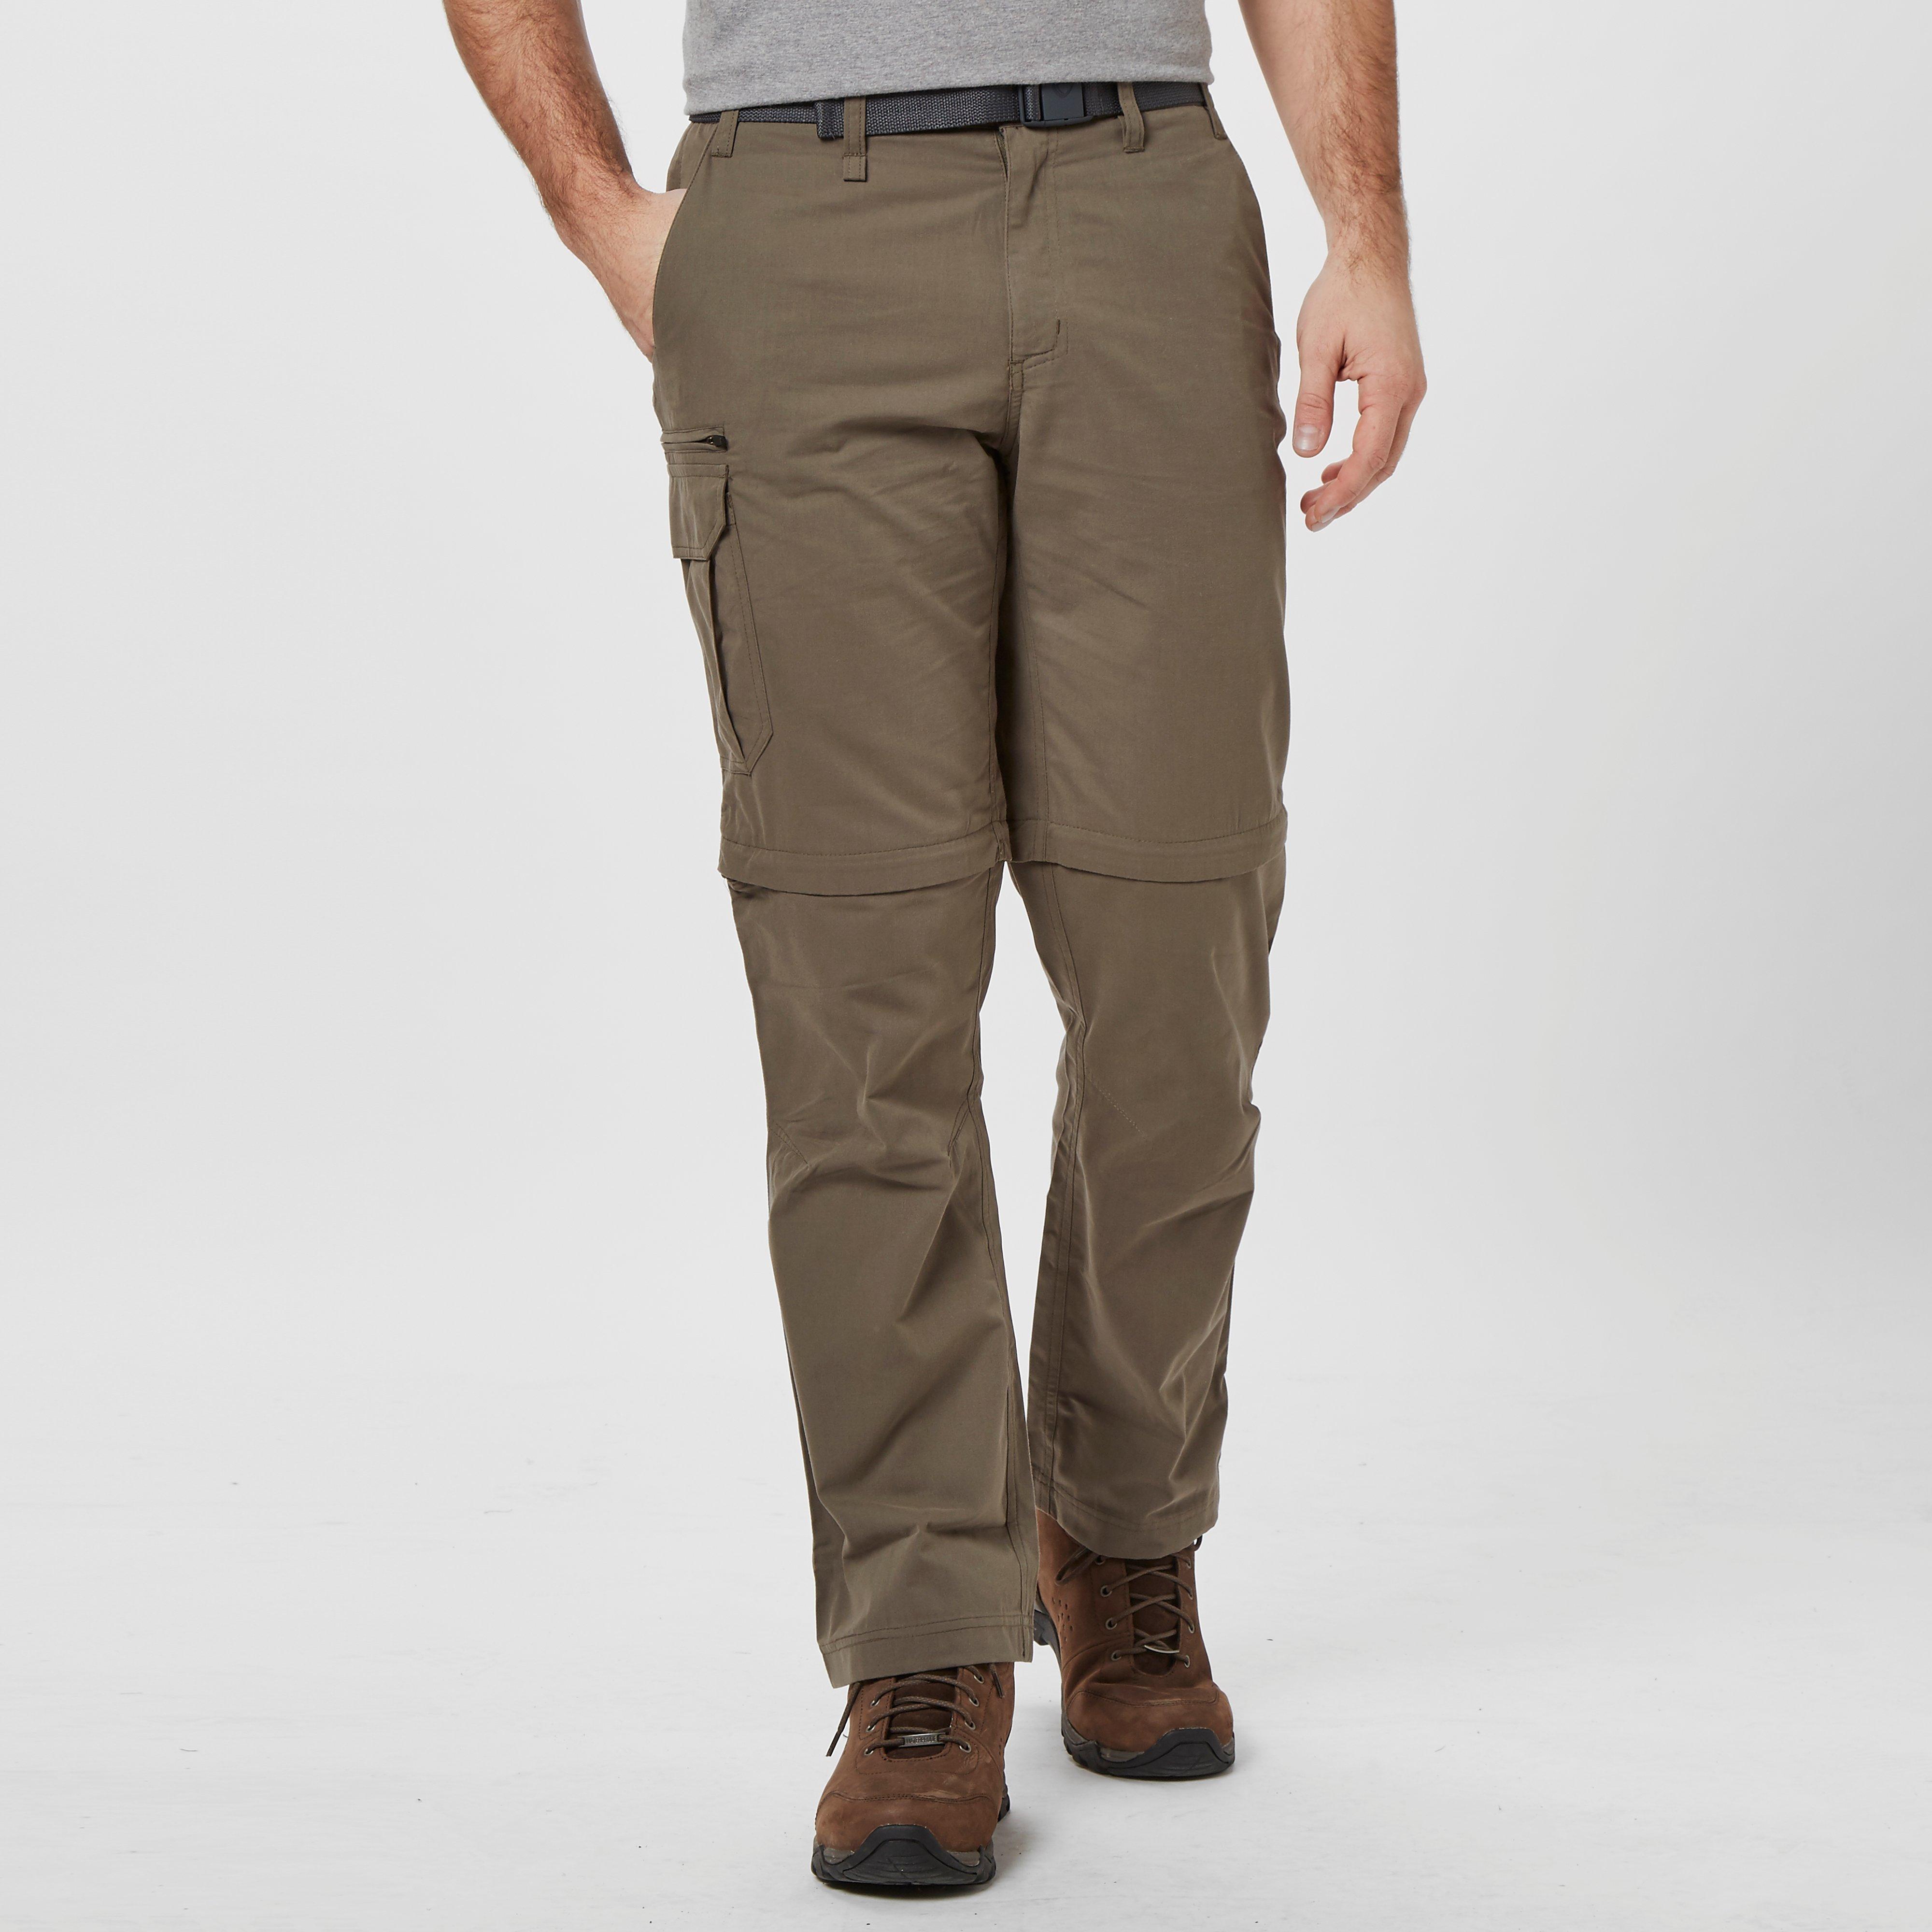 Brasher Mens Convertible Trouser - Brown/brn  Brown/brn